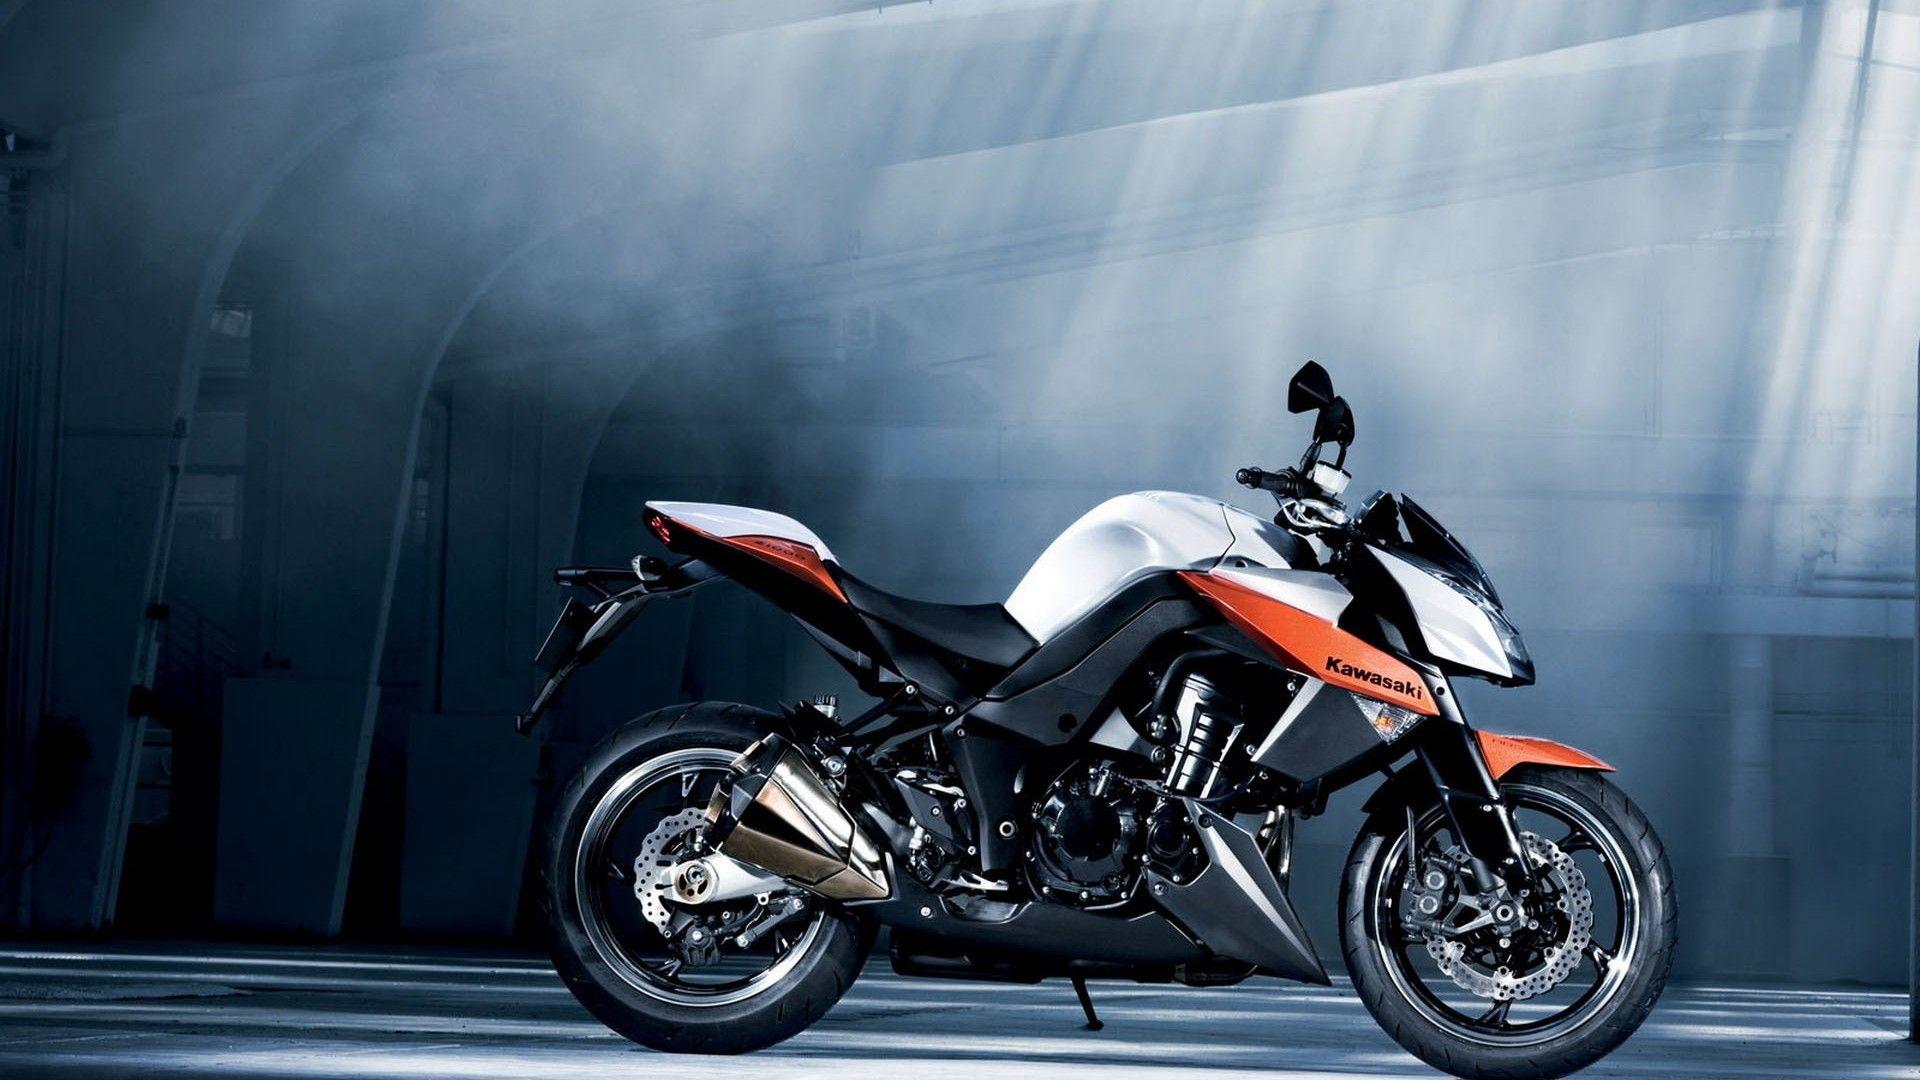 Kawasaki India to open 10 new motorcycle dealerships throughout nation